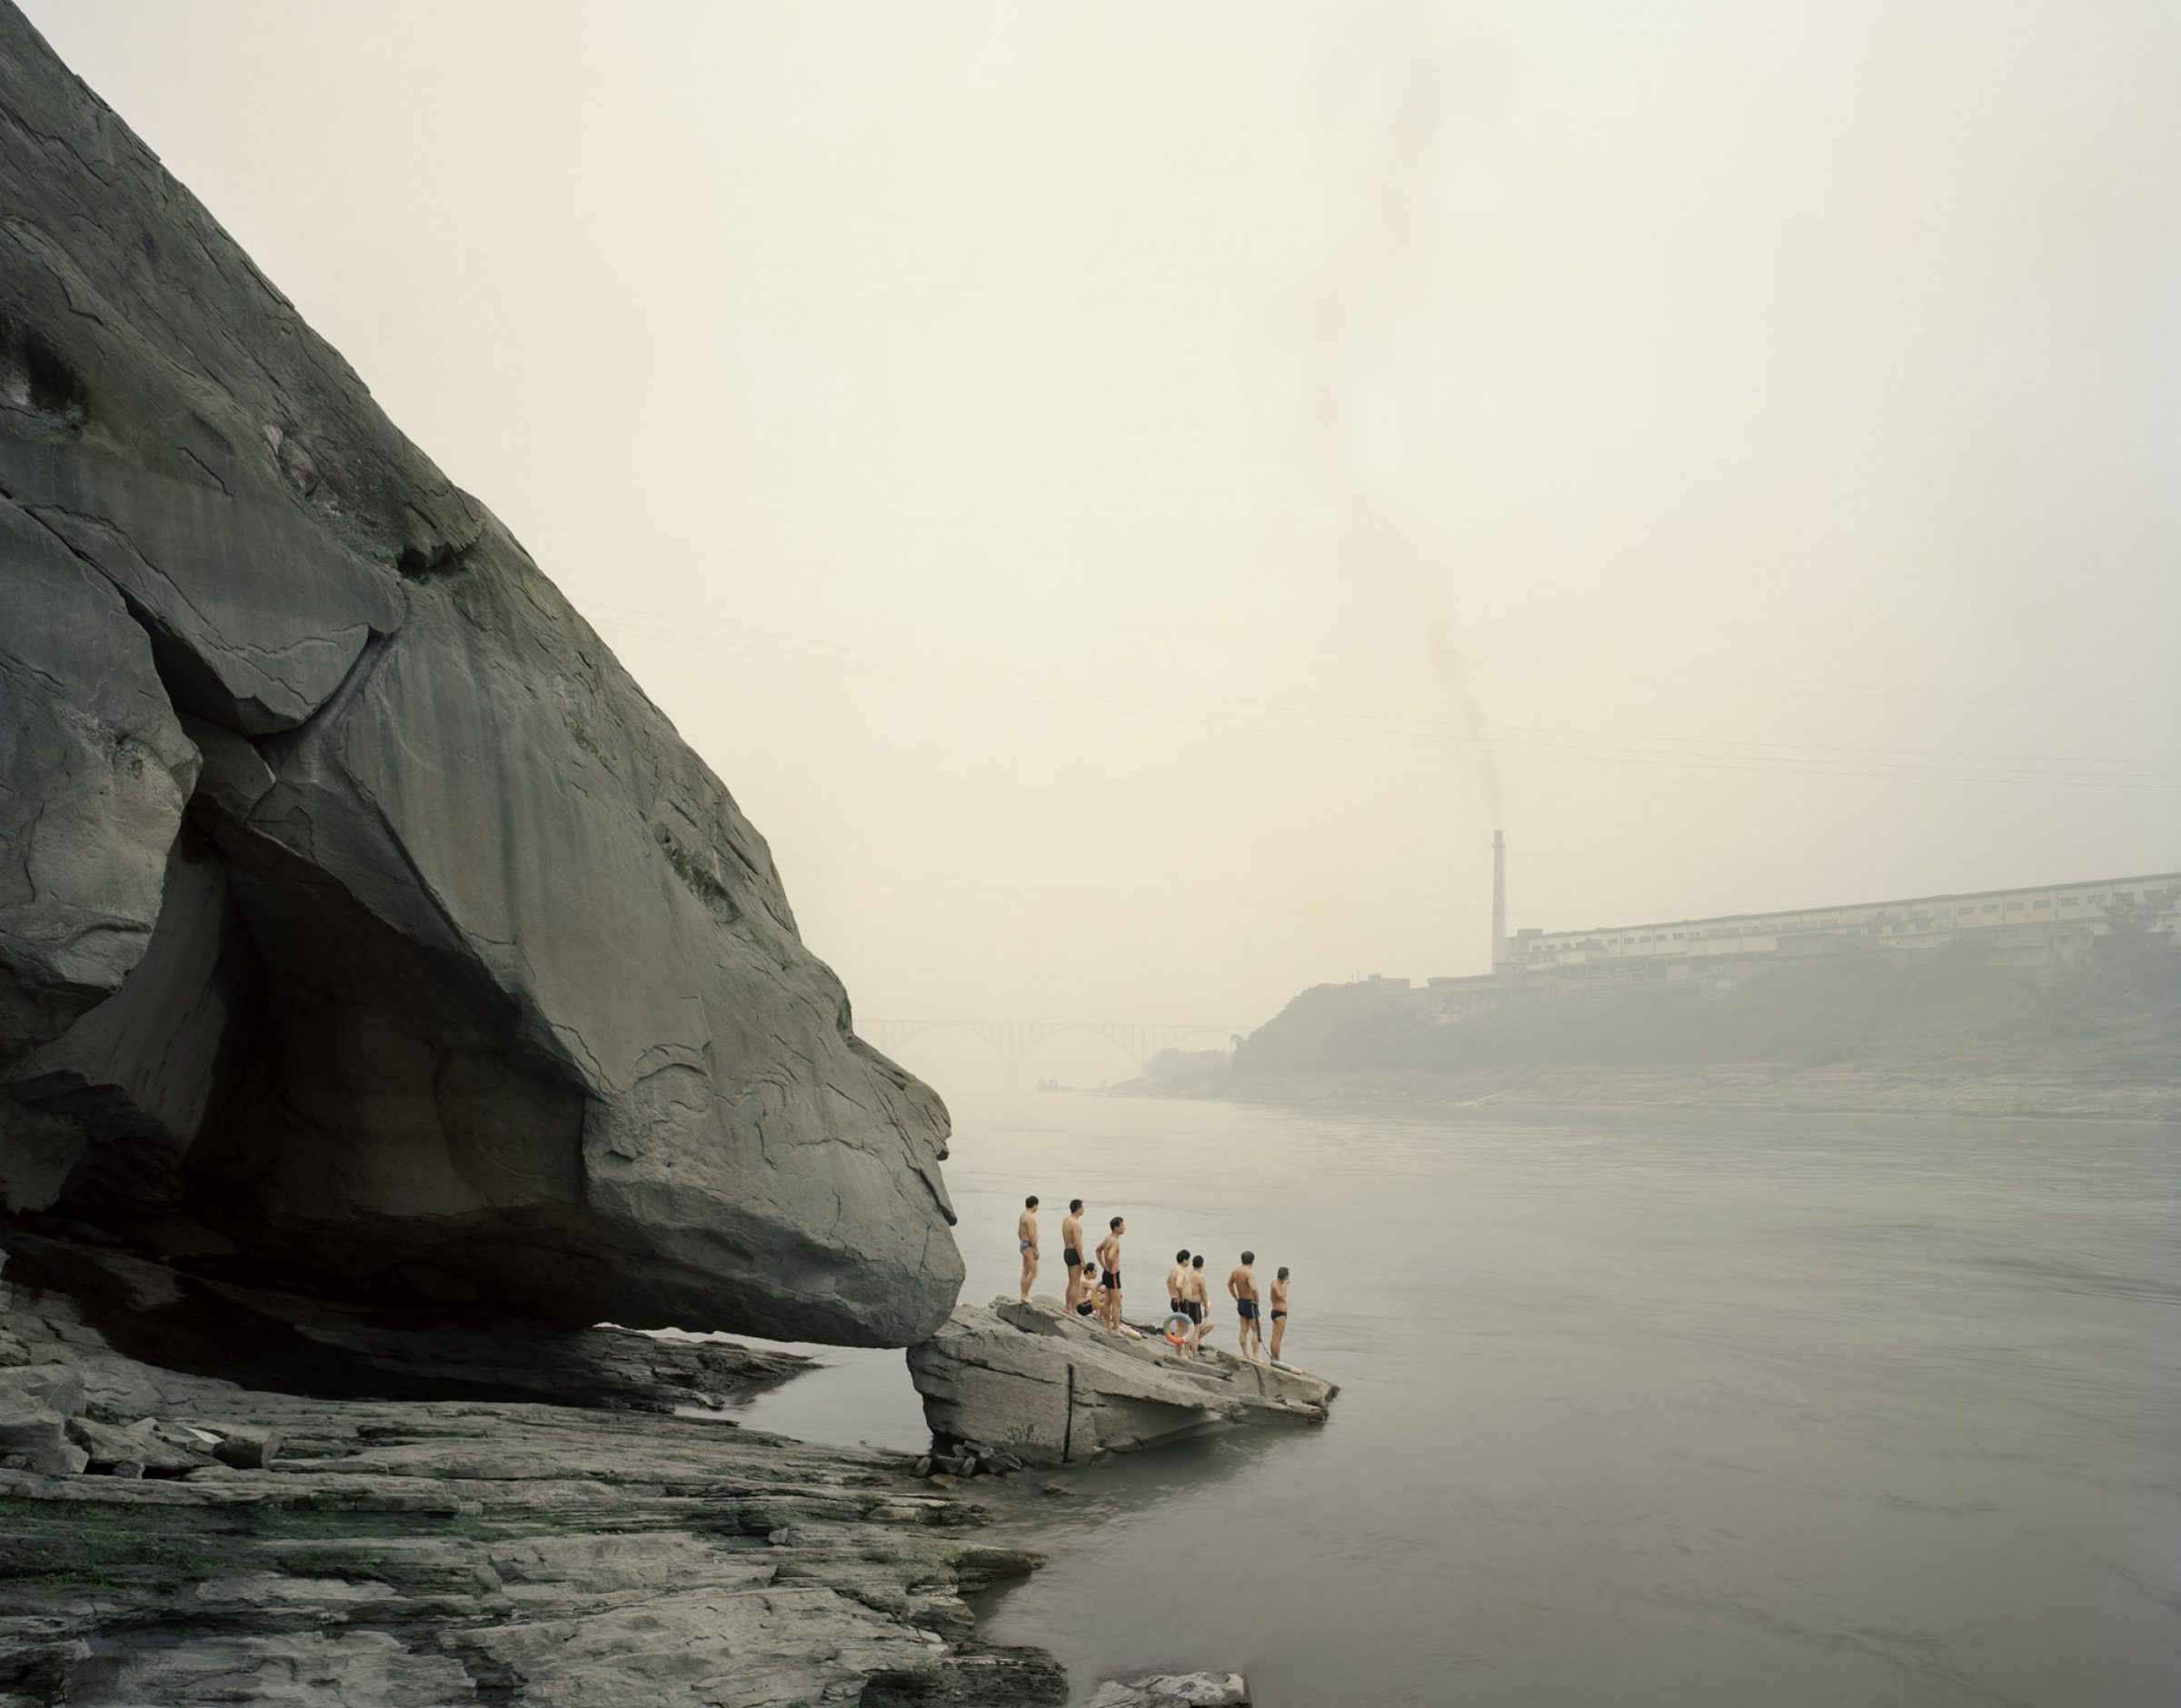 Yibin I (Bathers), Sichuan Province, 2007 - From Yangtze, The Long River photograph by Nadav Kander